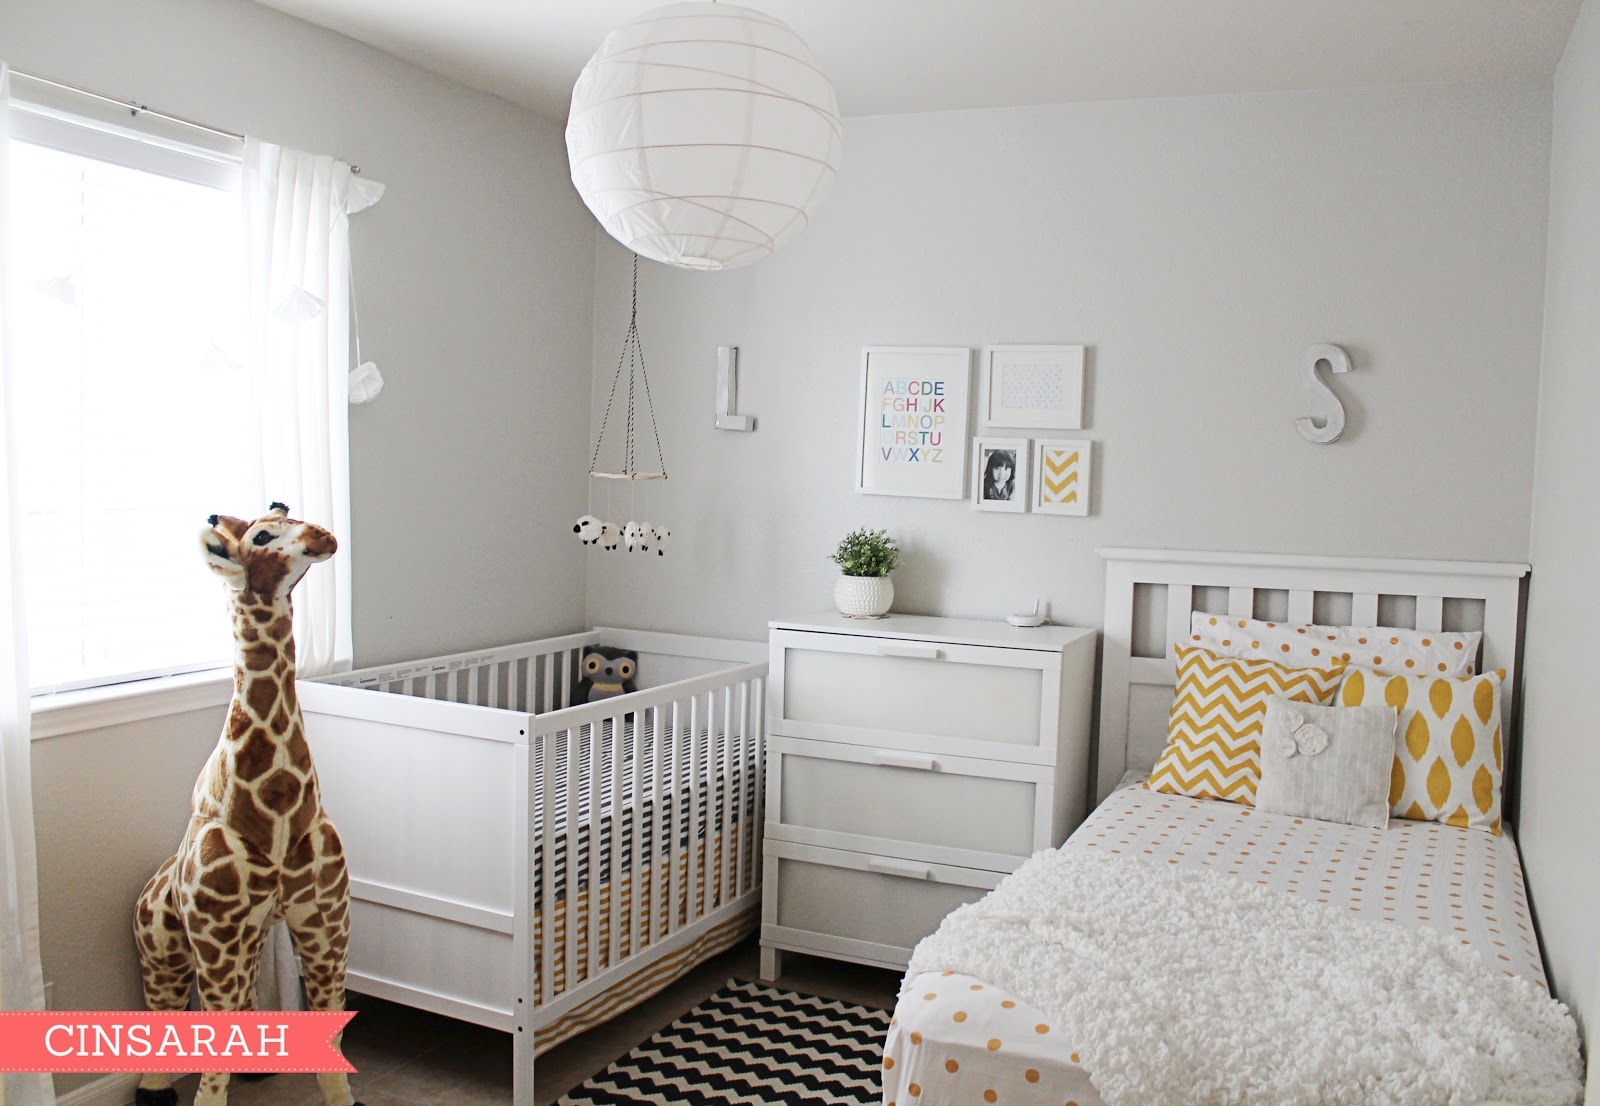 Cinsarah levi 39 s shared nursery reveal - Shared bedroom ideas for small rooms ...